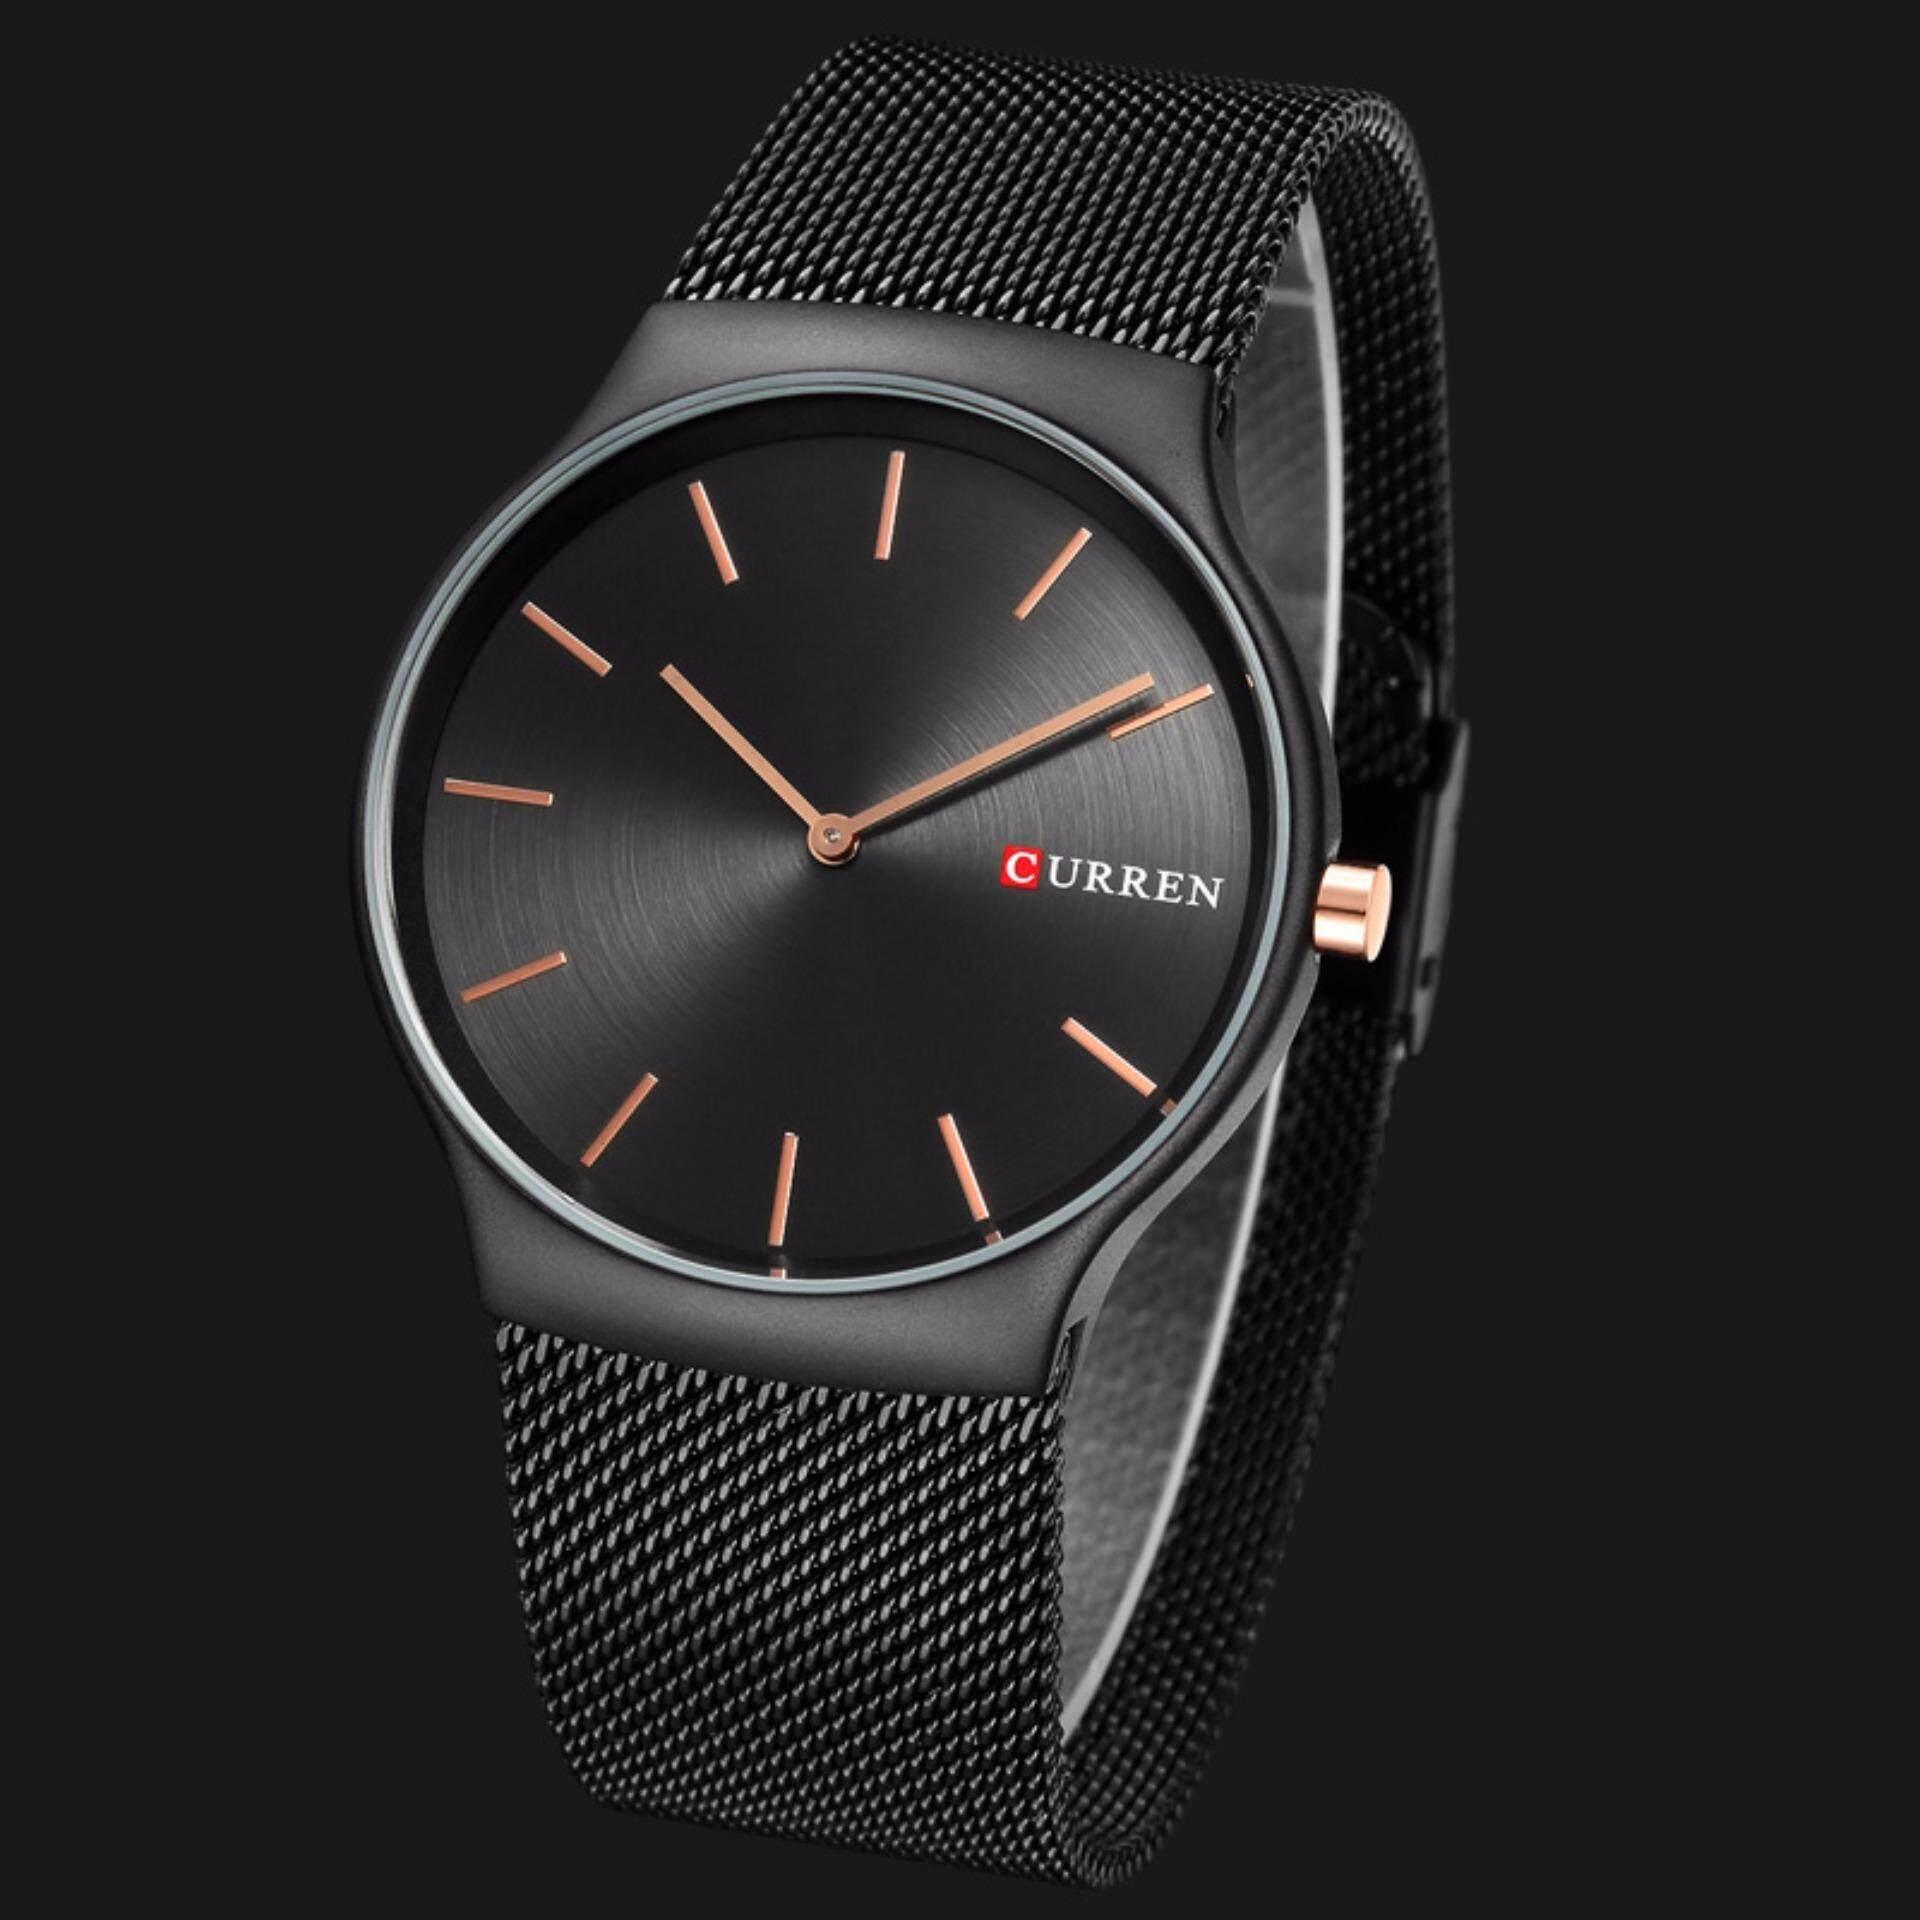 Cek Harga Curren 8256 Black Rose Gold Pointer Luxury Brand Analog Jam Tangan 8139 Casual Style Watch Sports Wristwatch Quartz Business Men